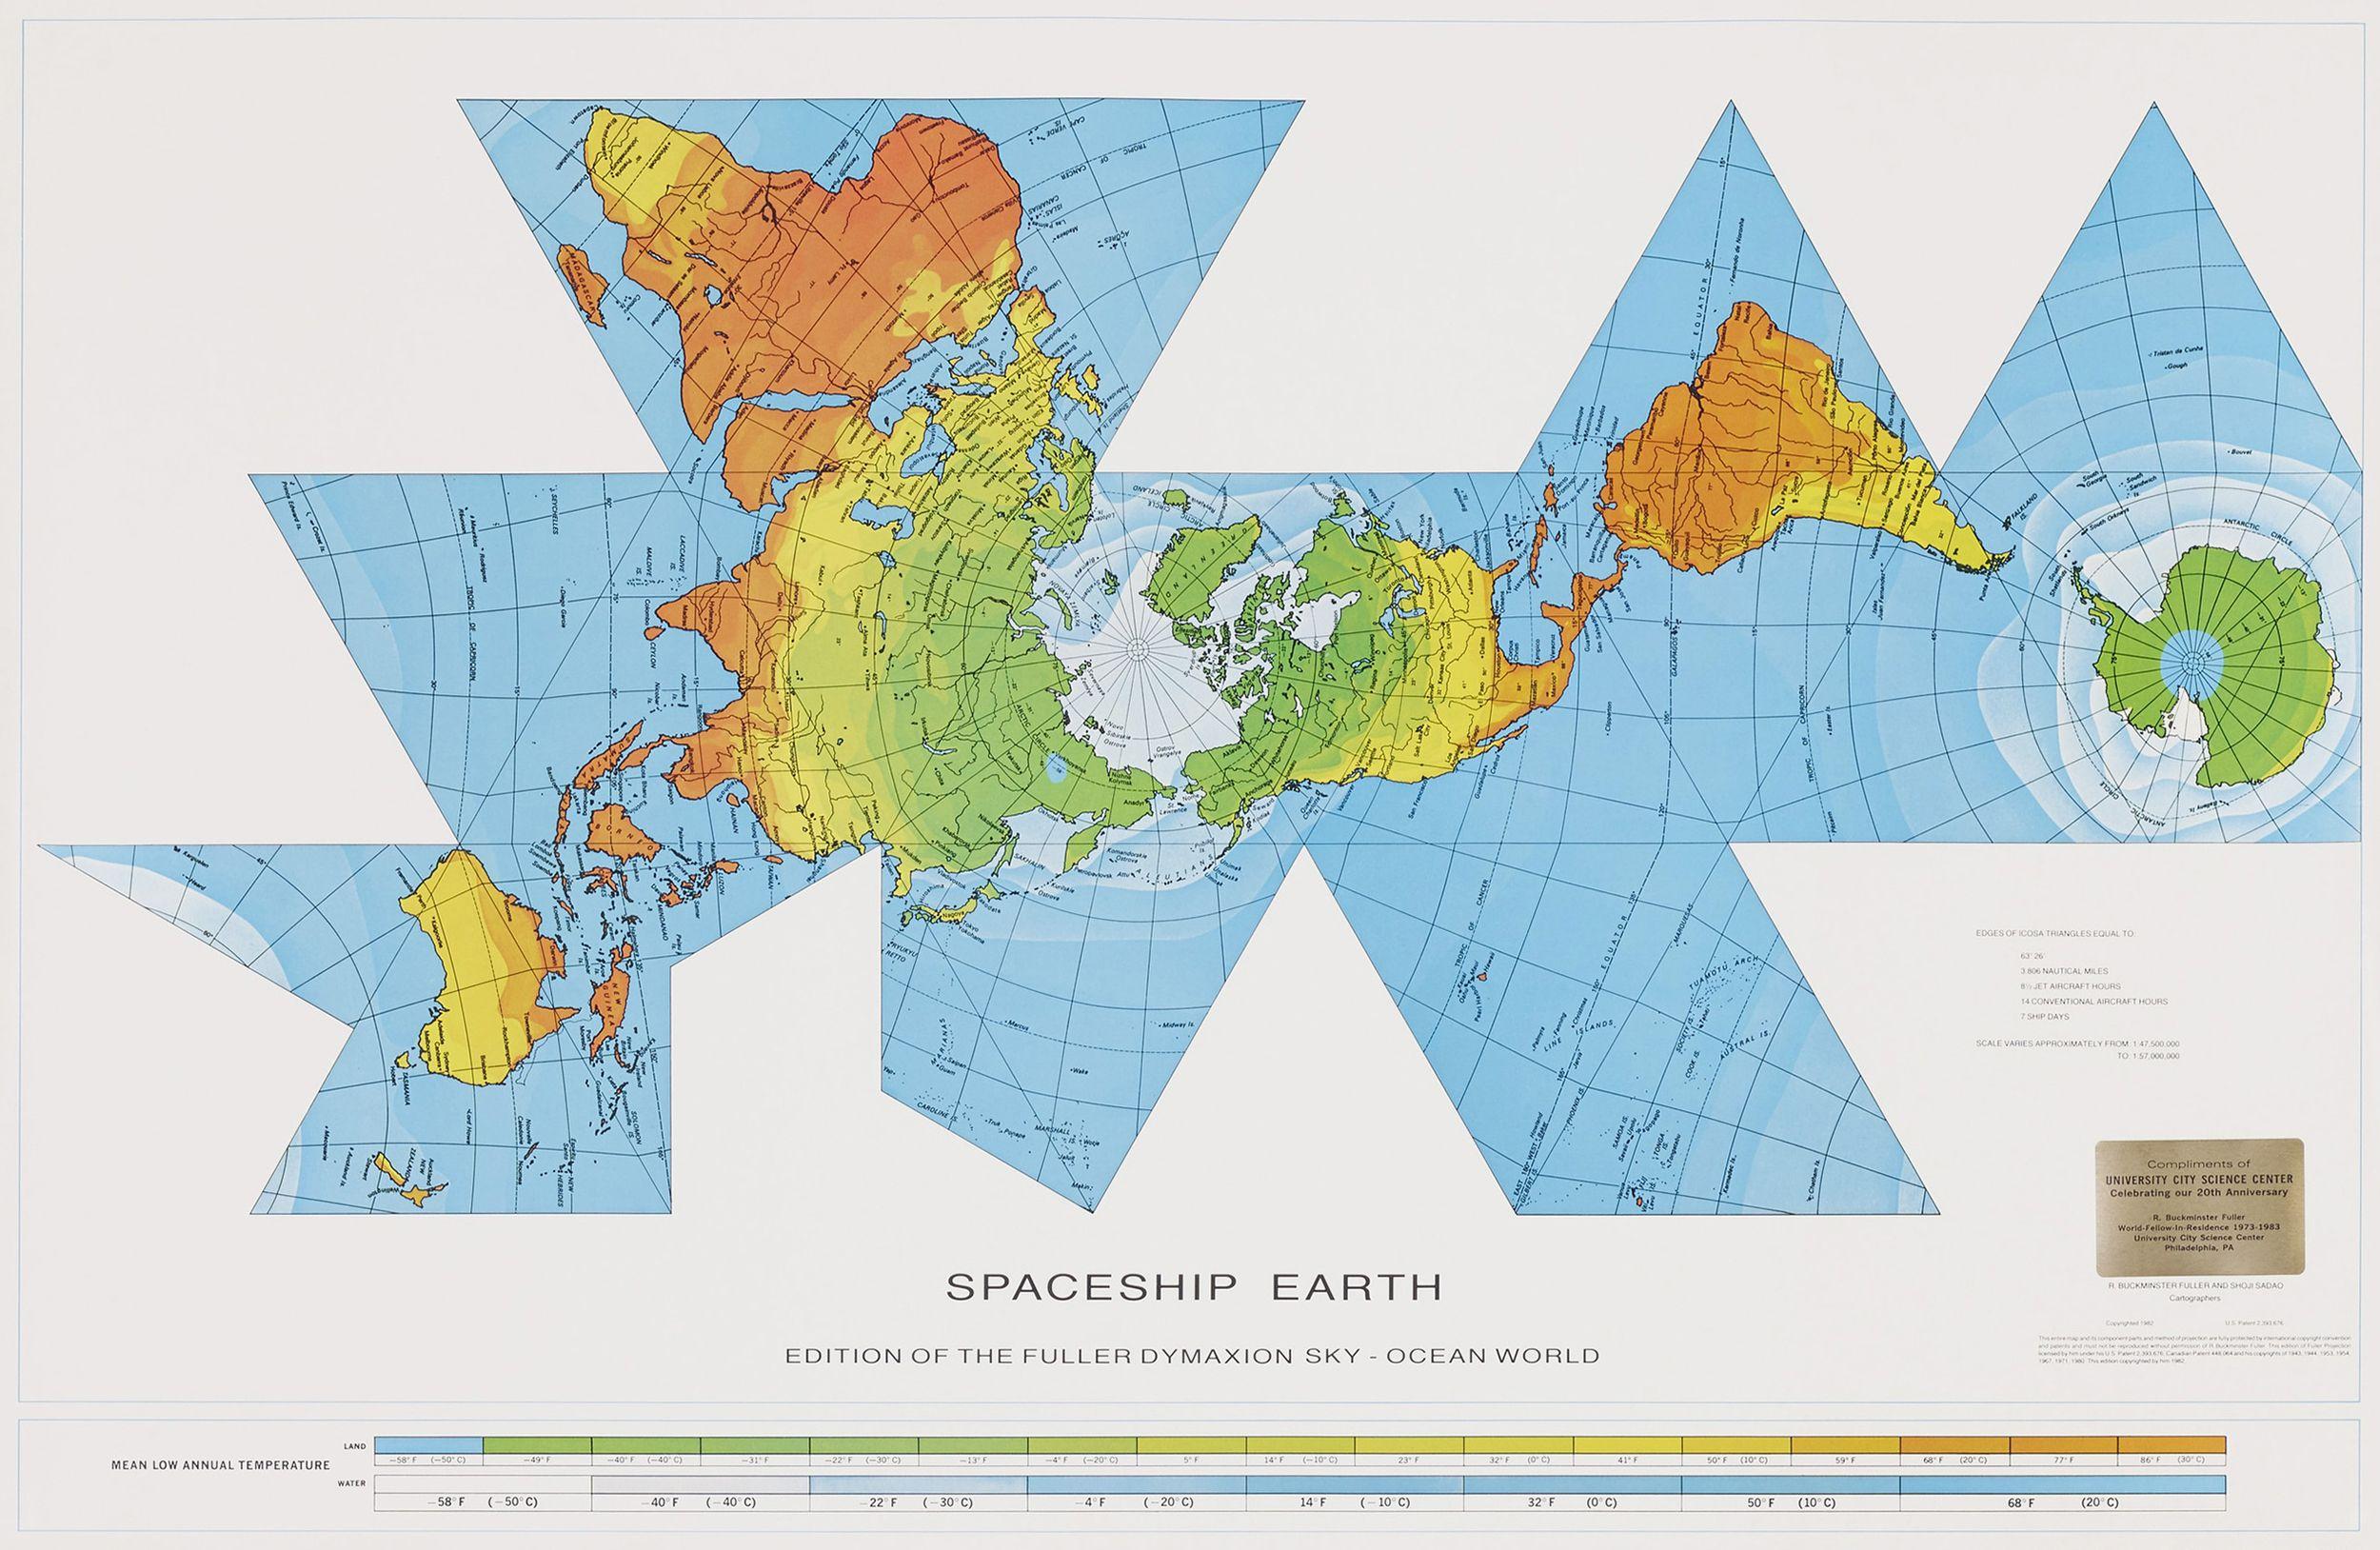 Dymaxion world map richard buckminster fuller atlas of places dymaxion world map richard buckminster fuller atlas of places gumiabroncs Images